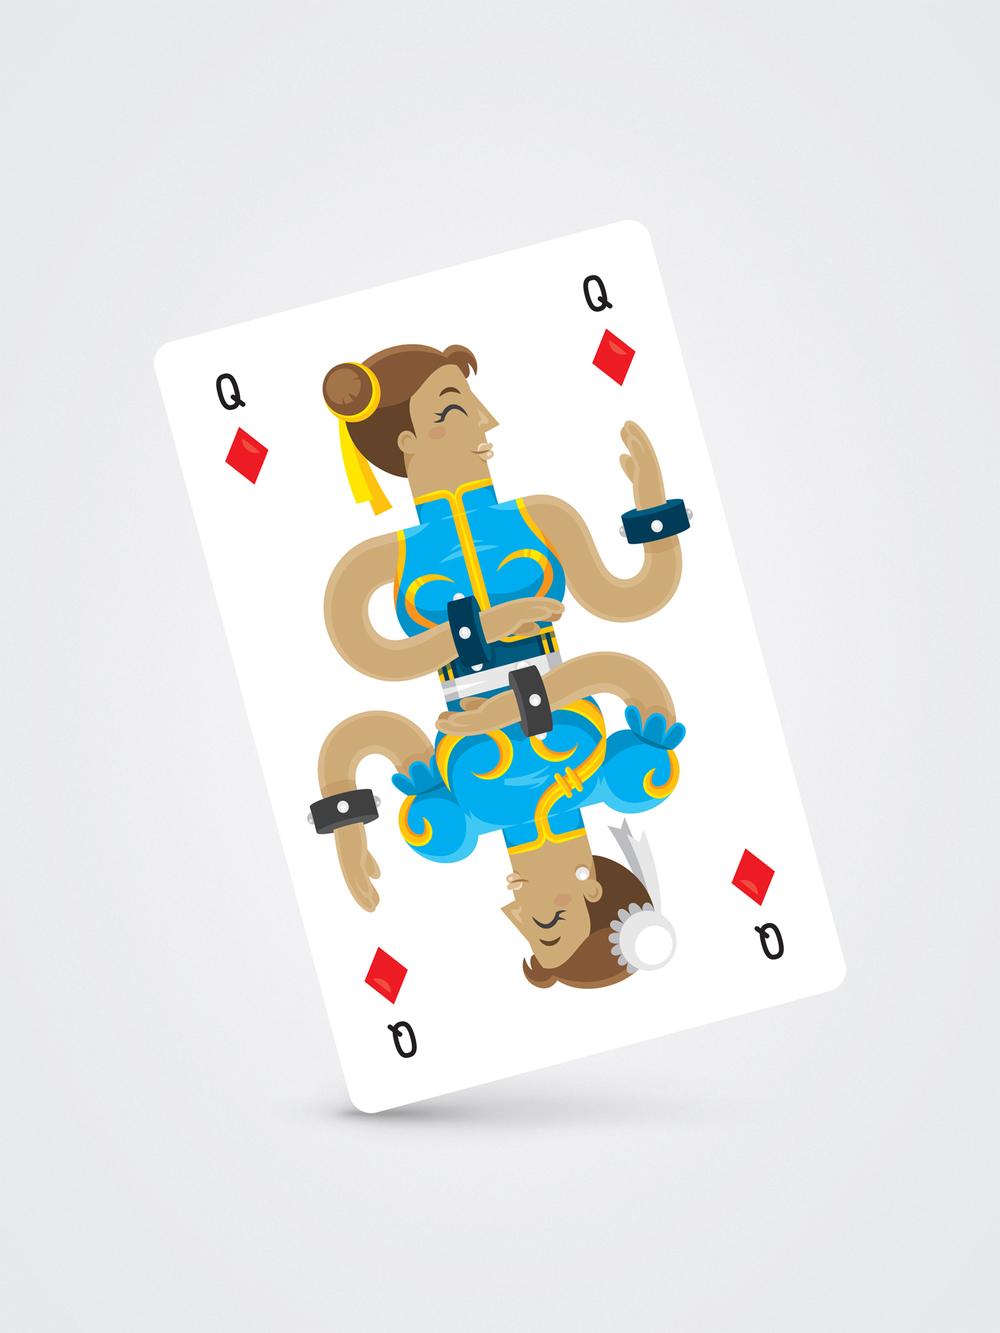 Chun Li – Queen of Diamonds